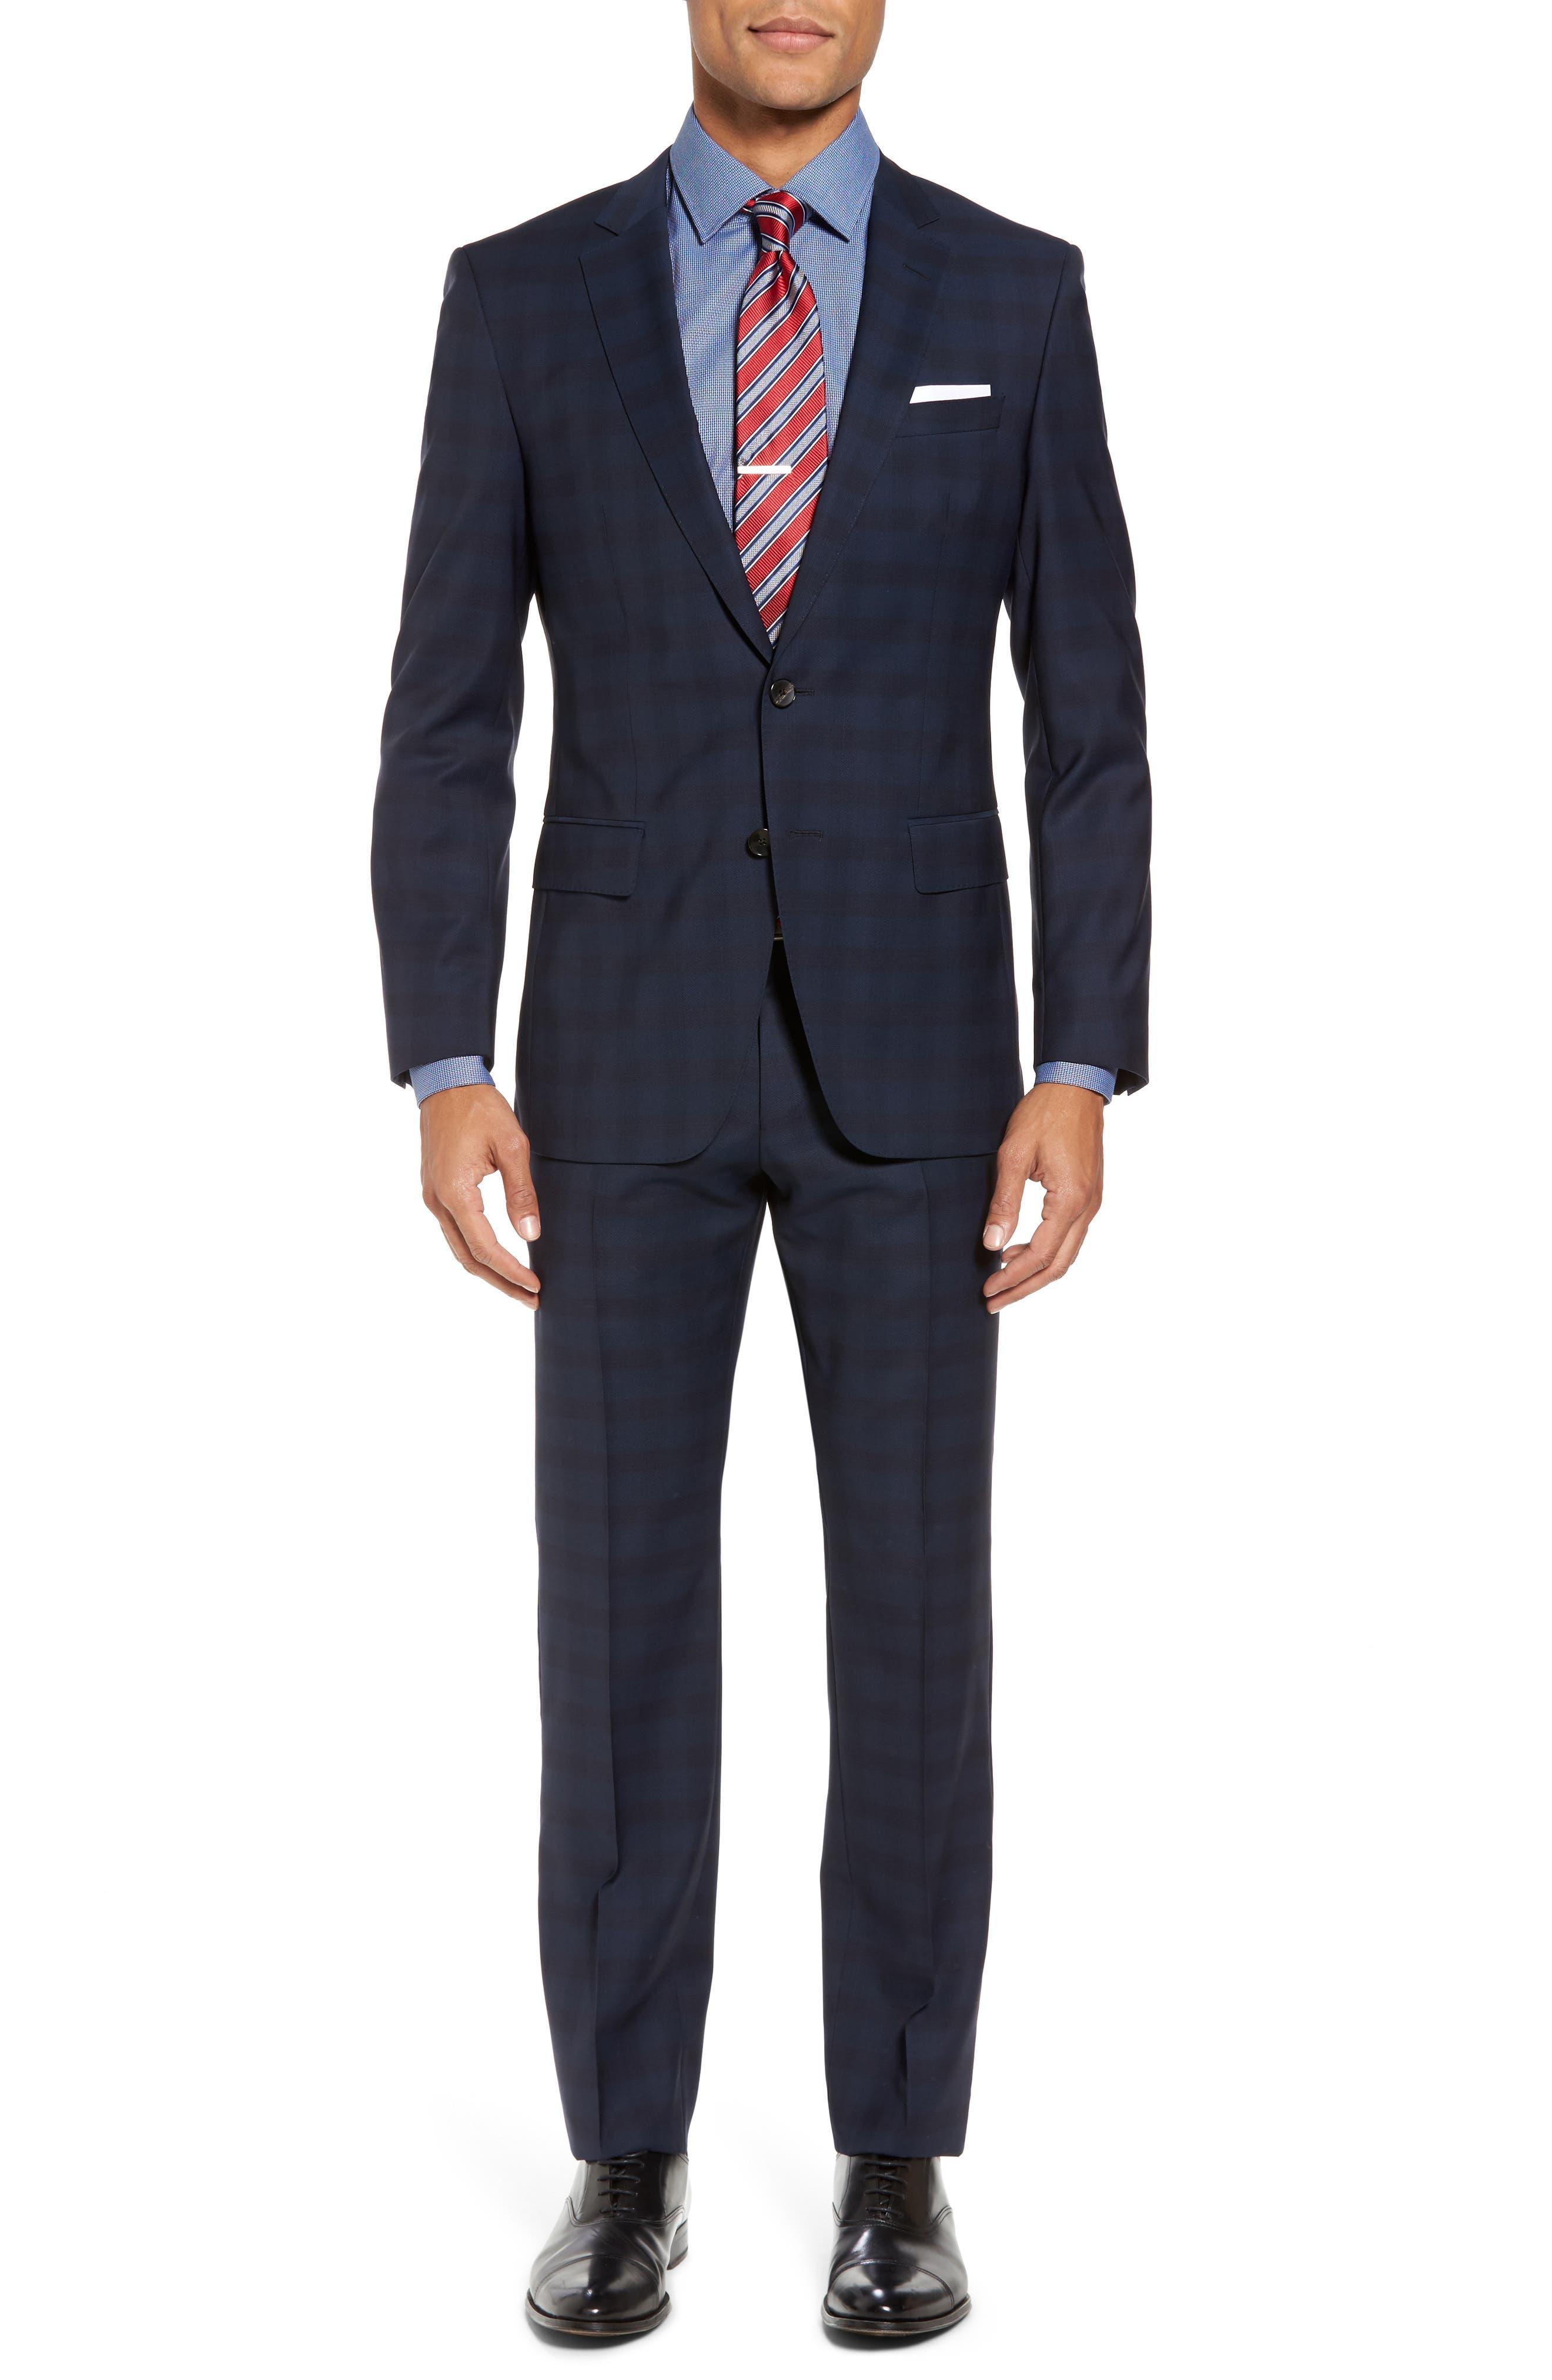 Alternate Image 1 Selected - BOSS Huge/Genius Trim Fit Plaid Wool Suit